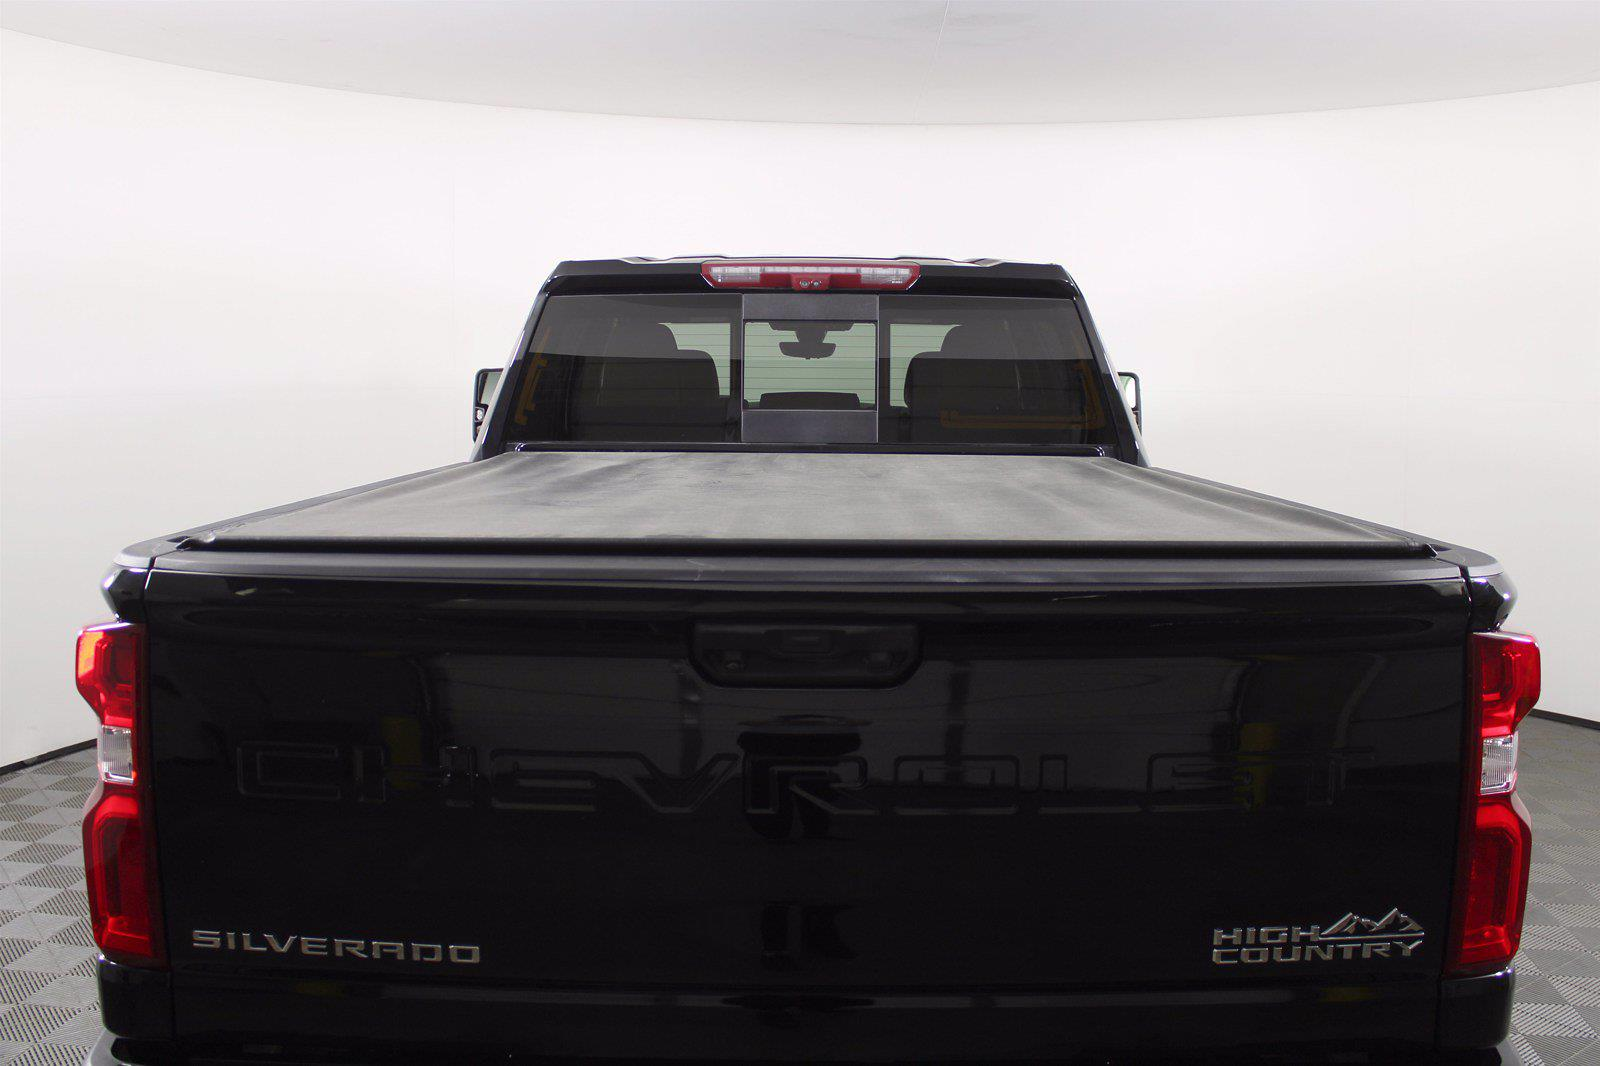 2020 Chevrolet Silverado 3500 Crew Cab 4x4, Pickup #DAZ0607 - photo 1